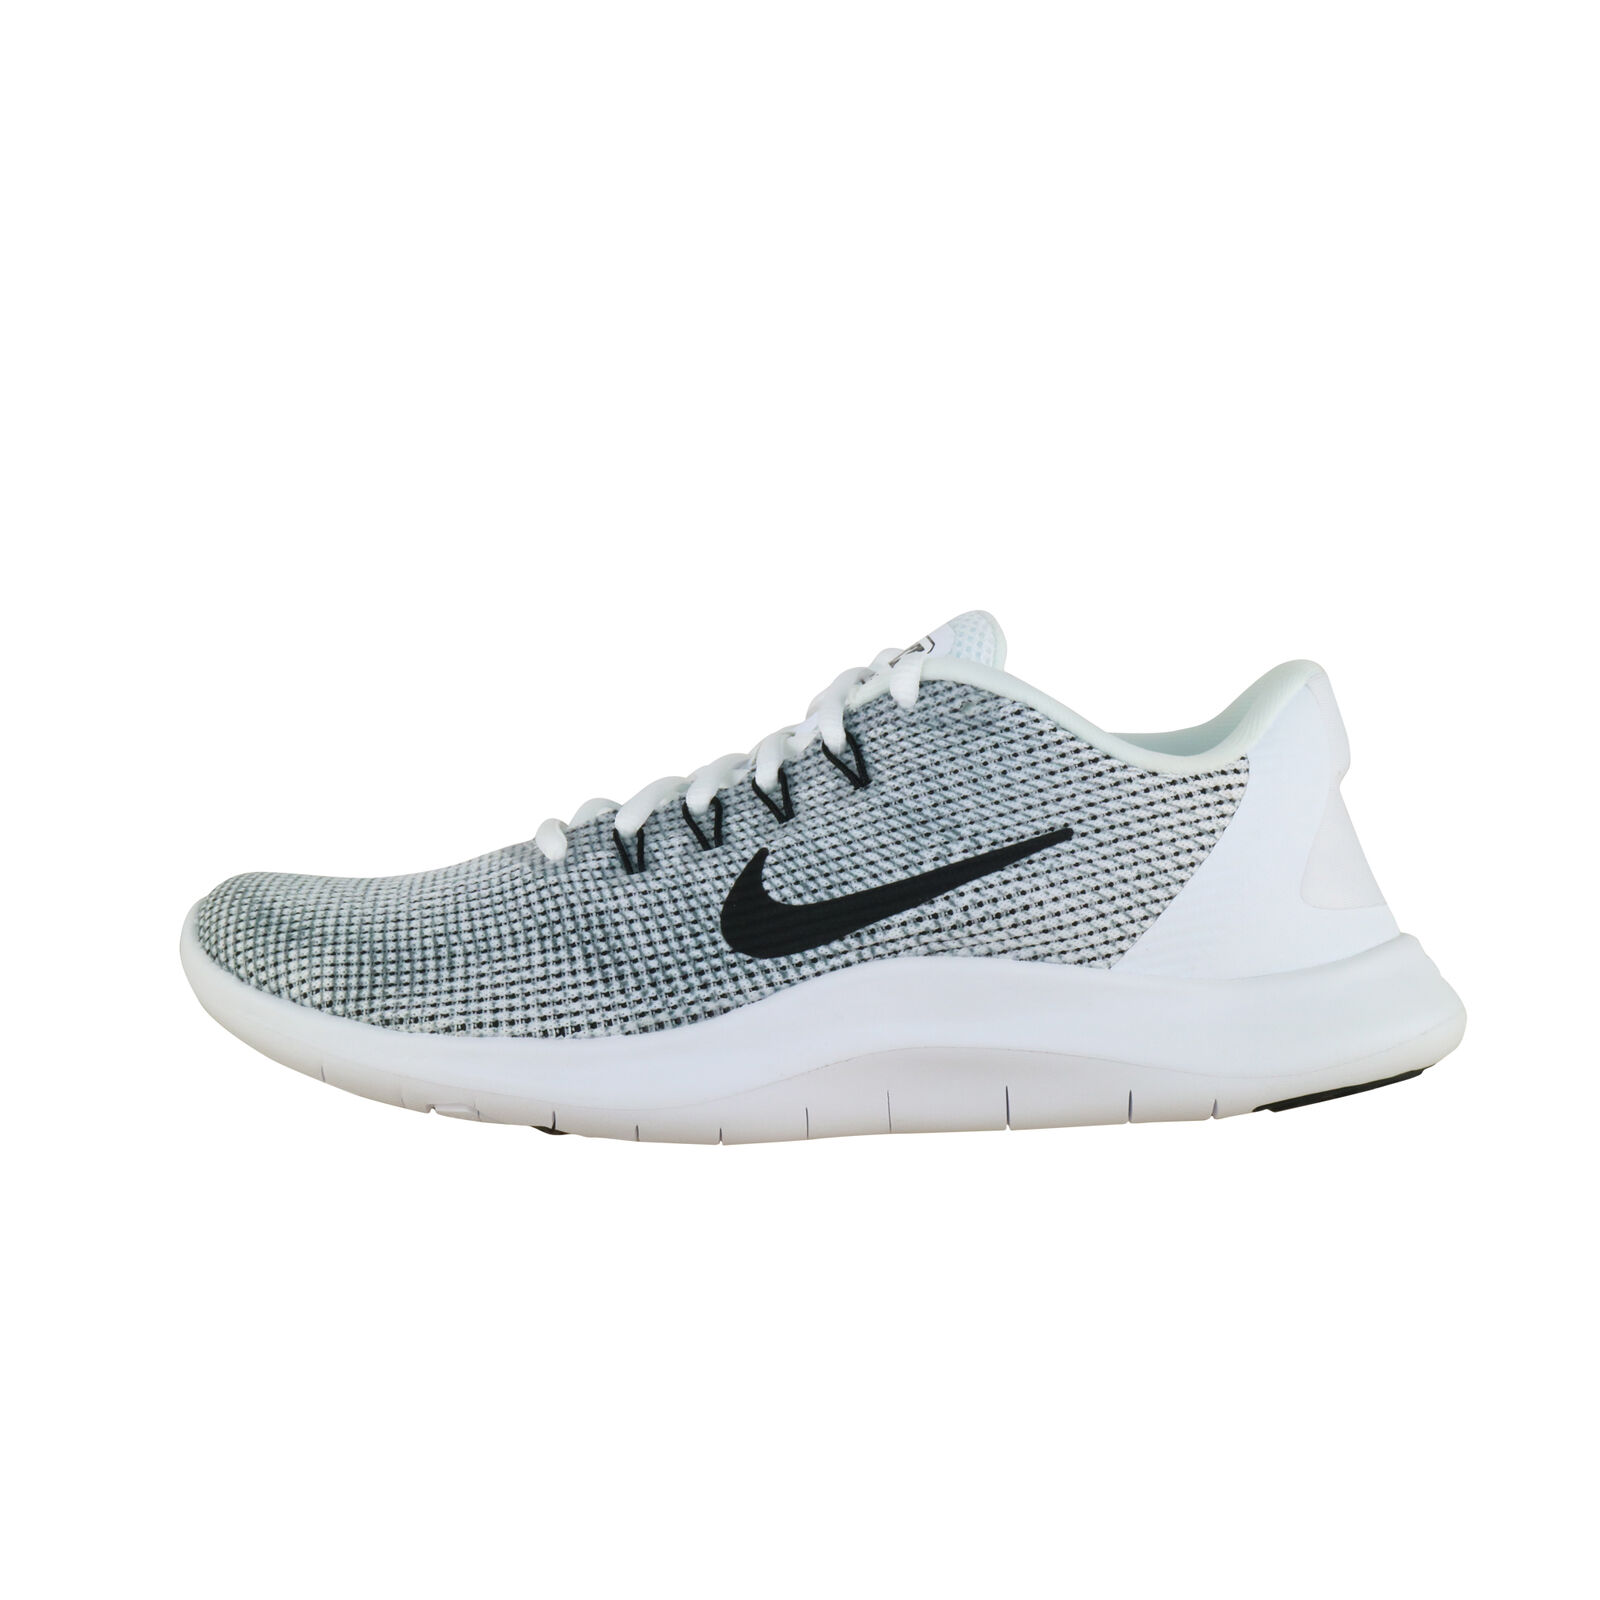 Nike Flex 2018 RN Women aa7408-100   exclusive designs